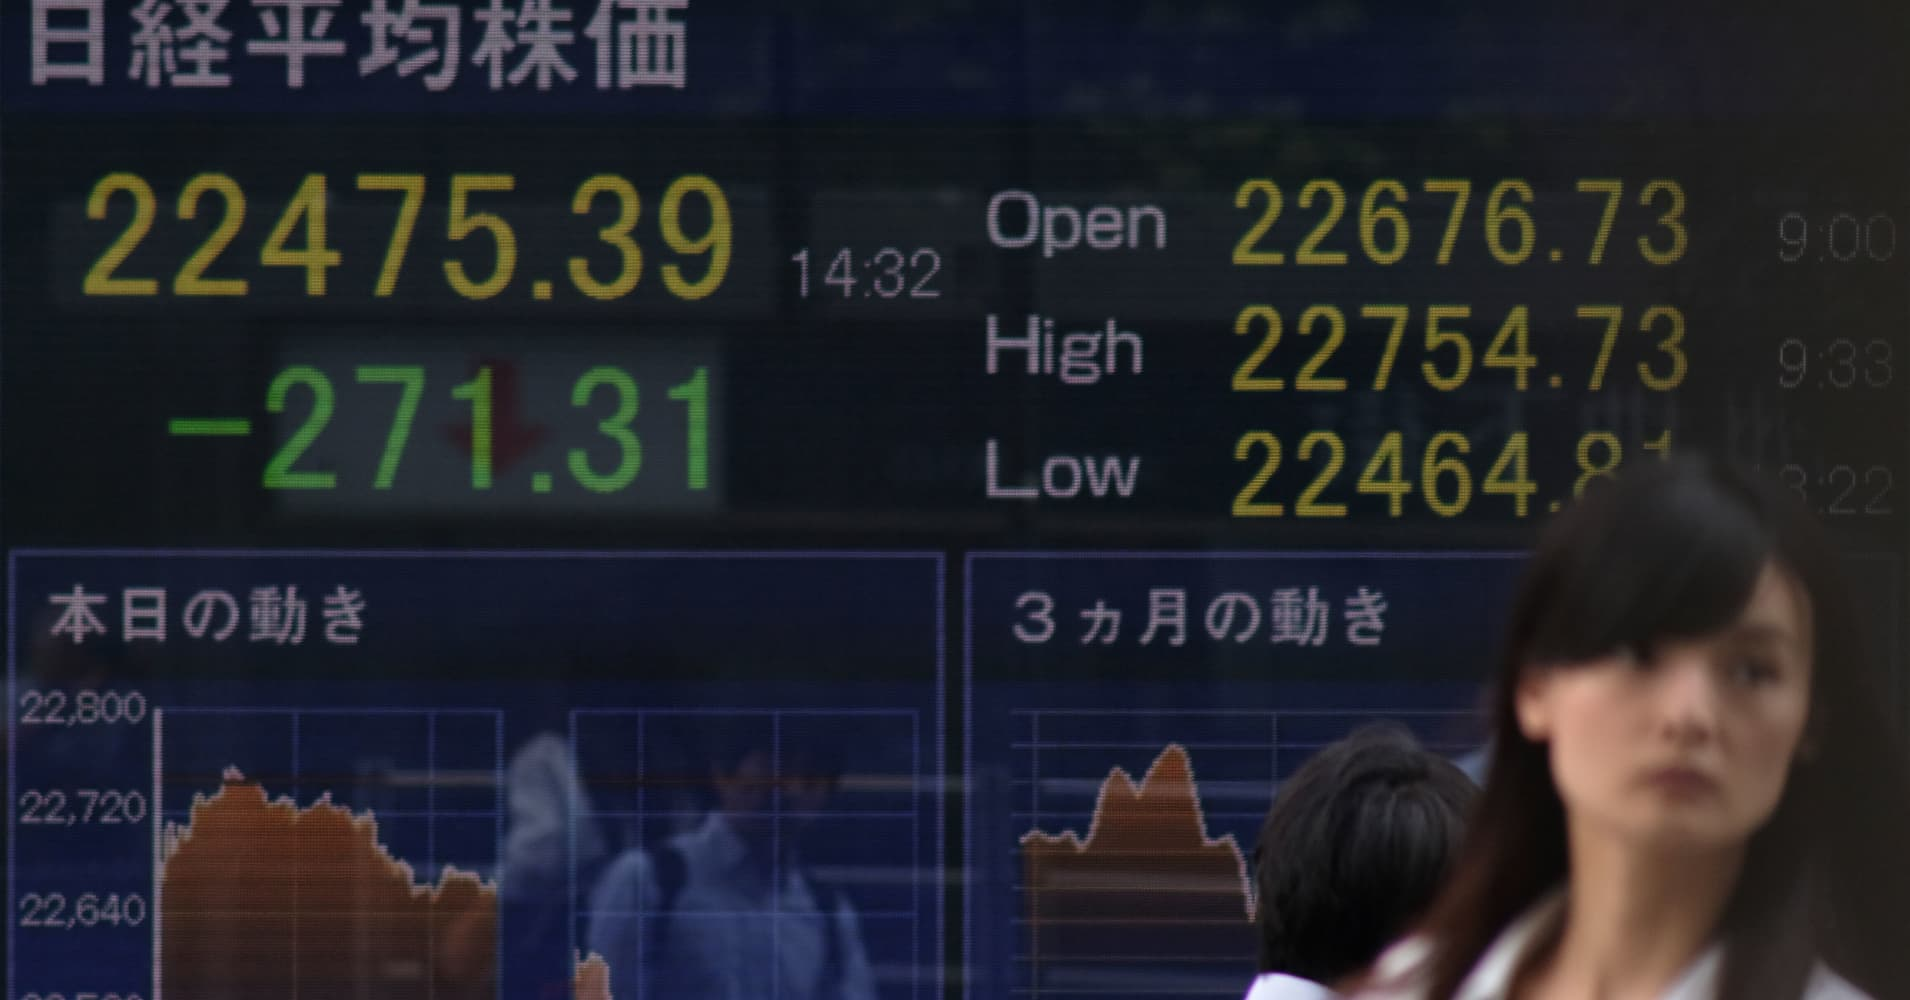 Asian shares decline amid investor worries over Turkey